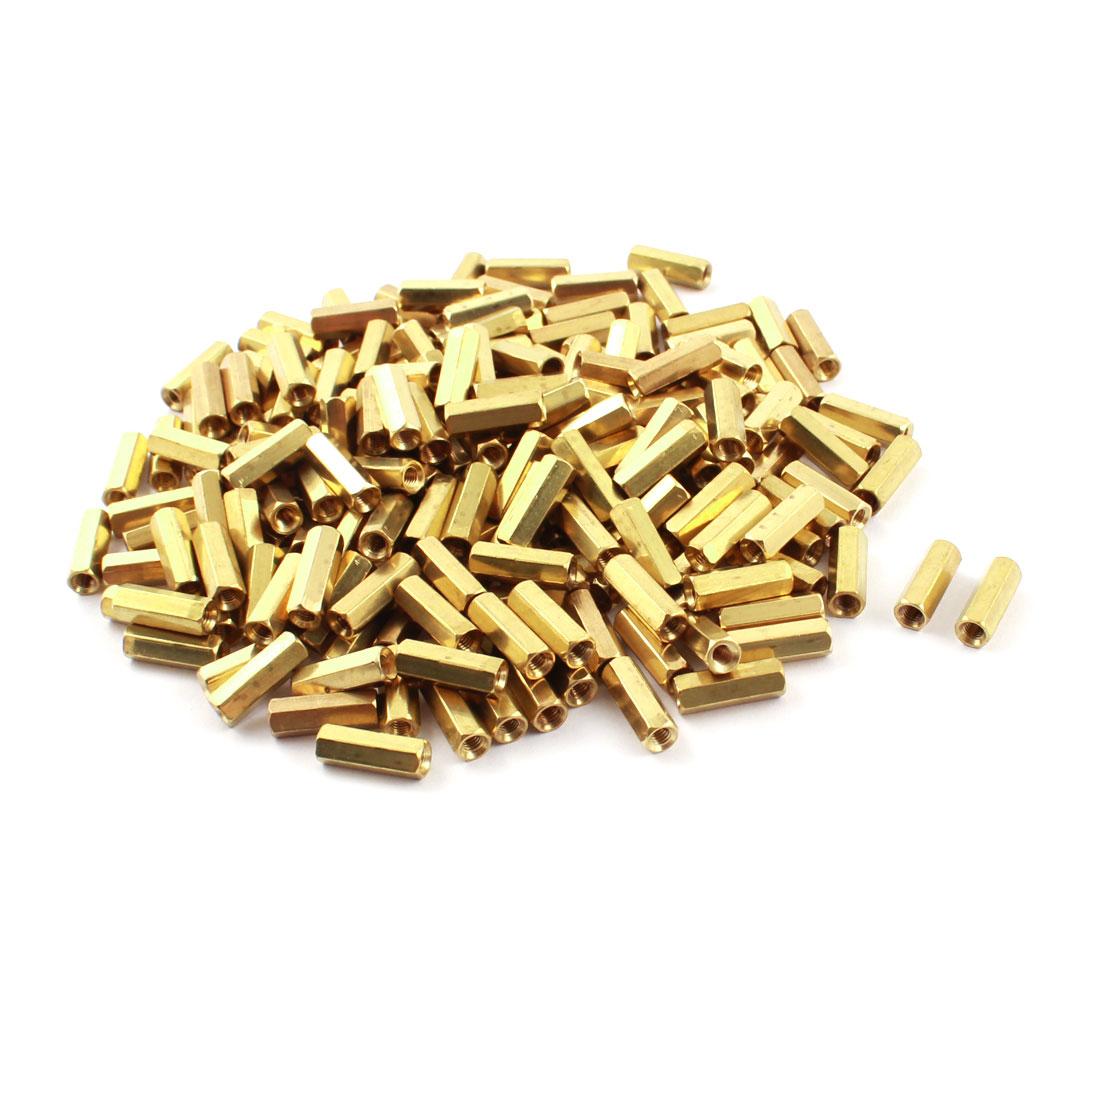 200Pcs M3 x 14mm Female Thread Dual Ends Gold Tone Brass Piller PCB Standoff Hexagonal Nut Spacer